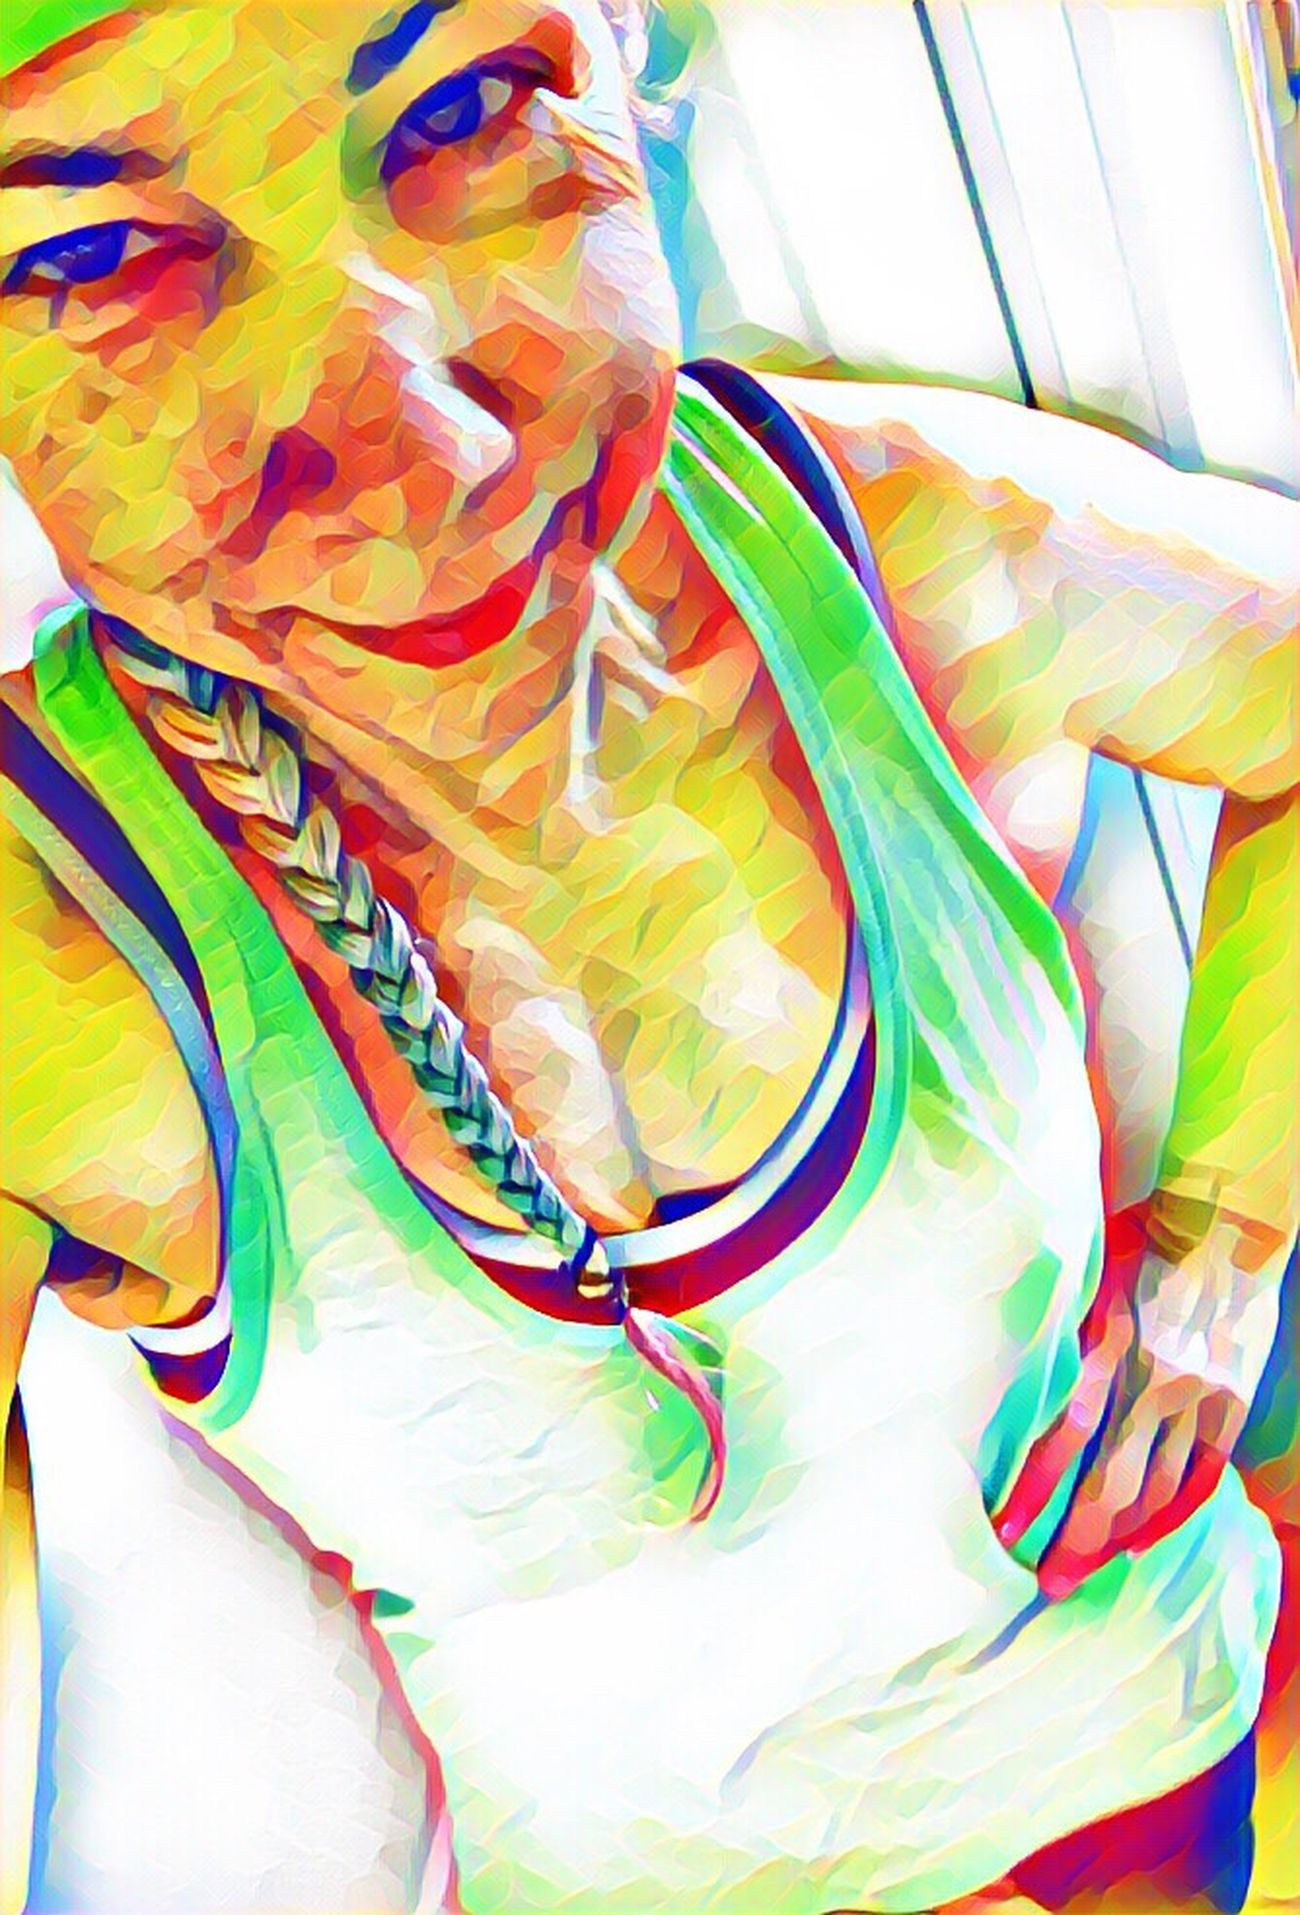 Feeling fit Multi Colored Photo Art Posterized Self Portrait